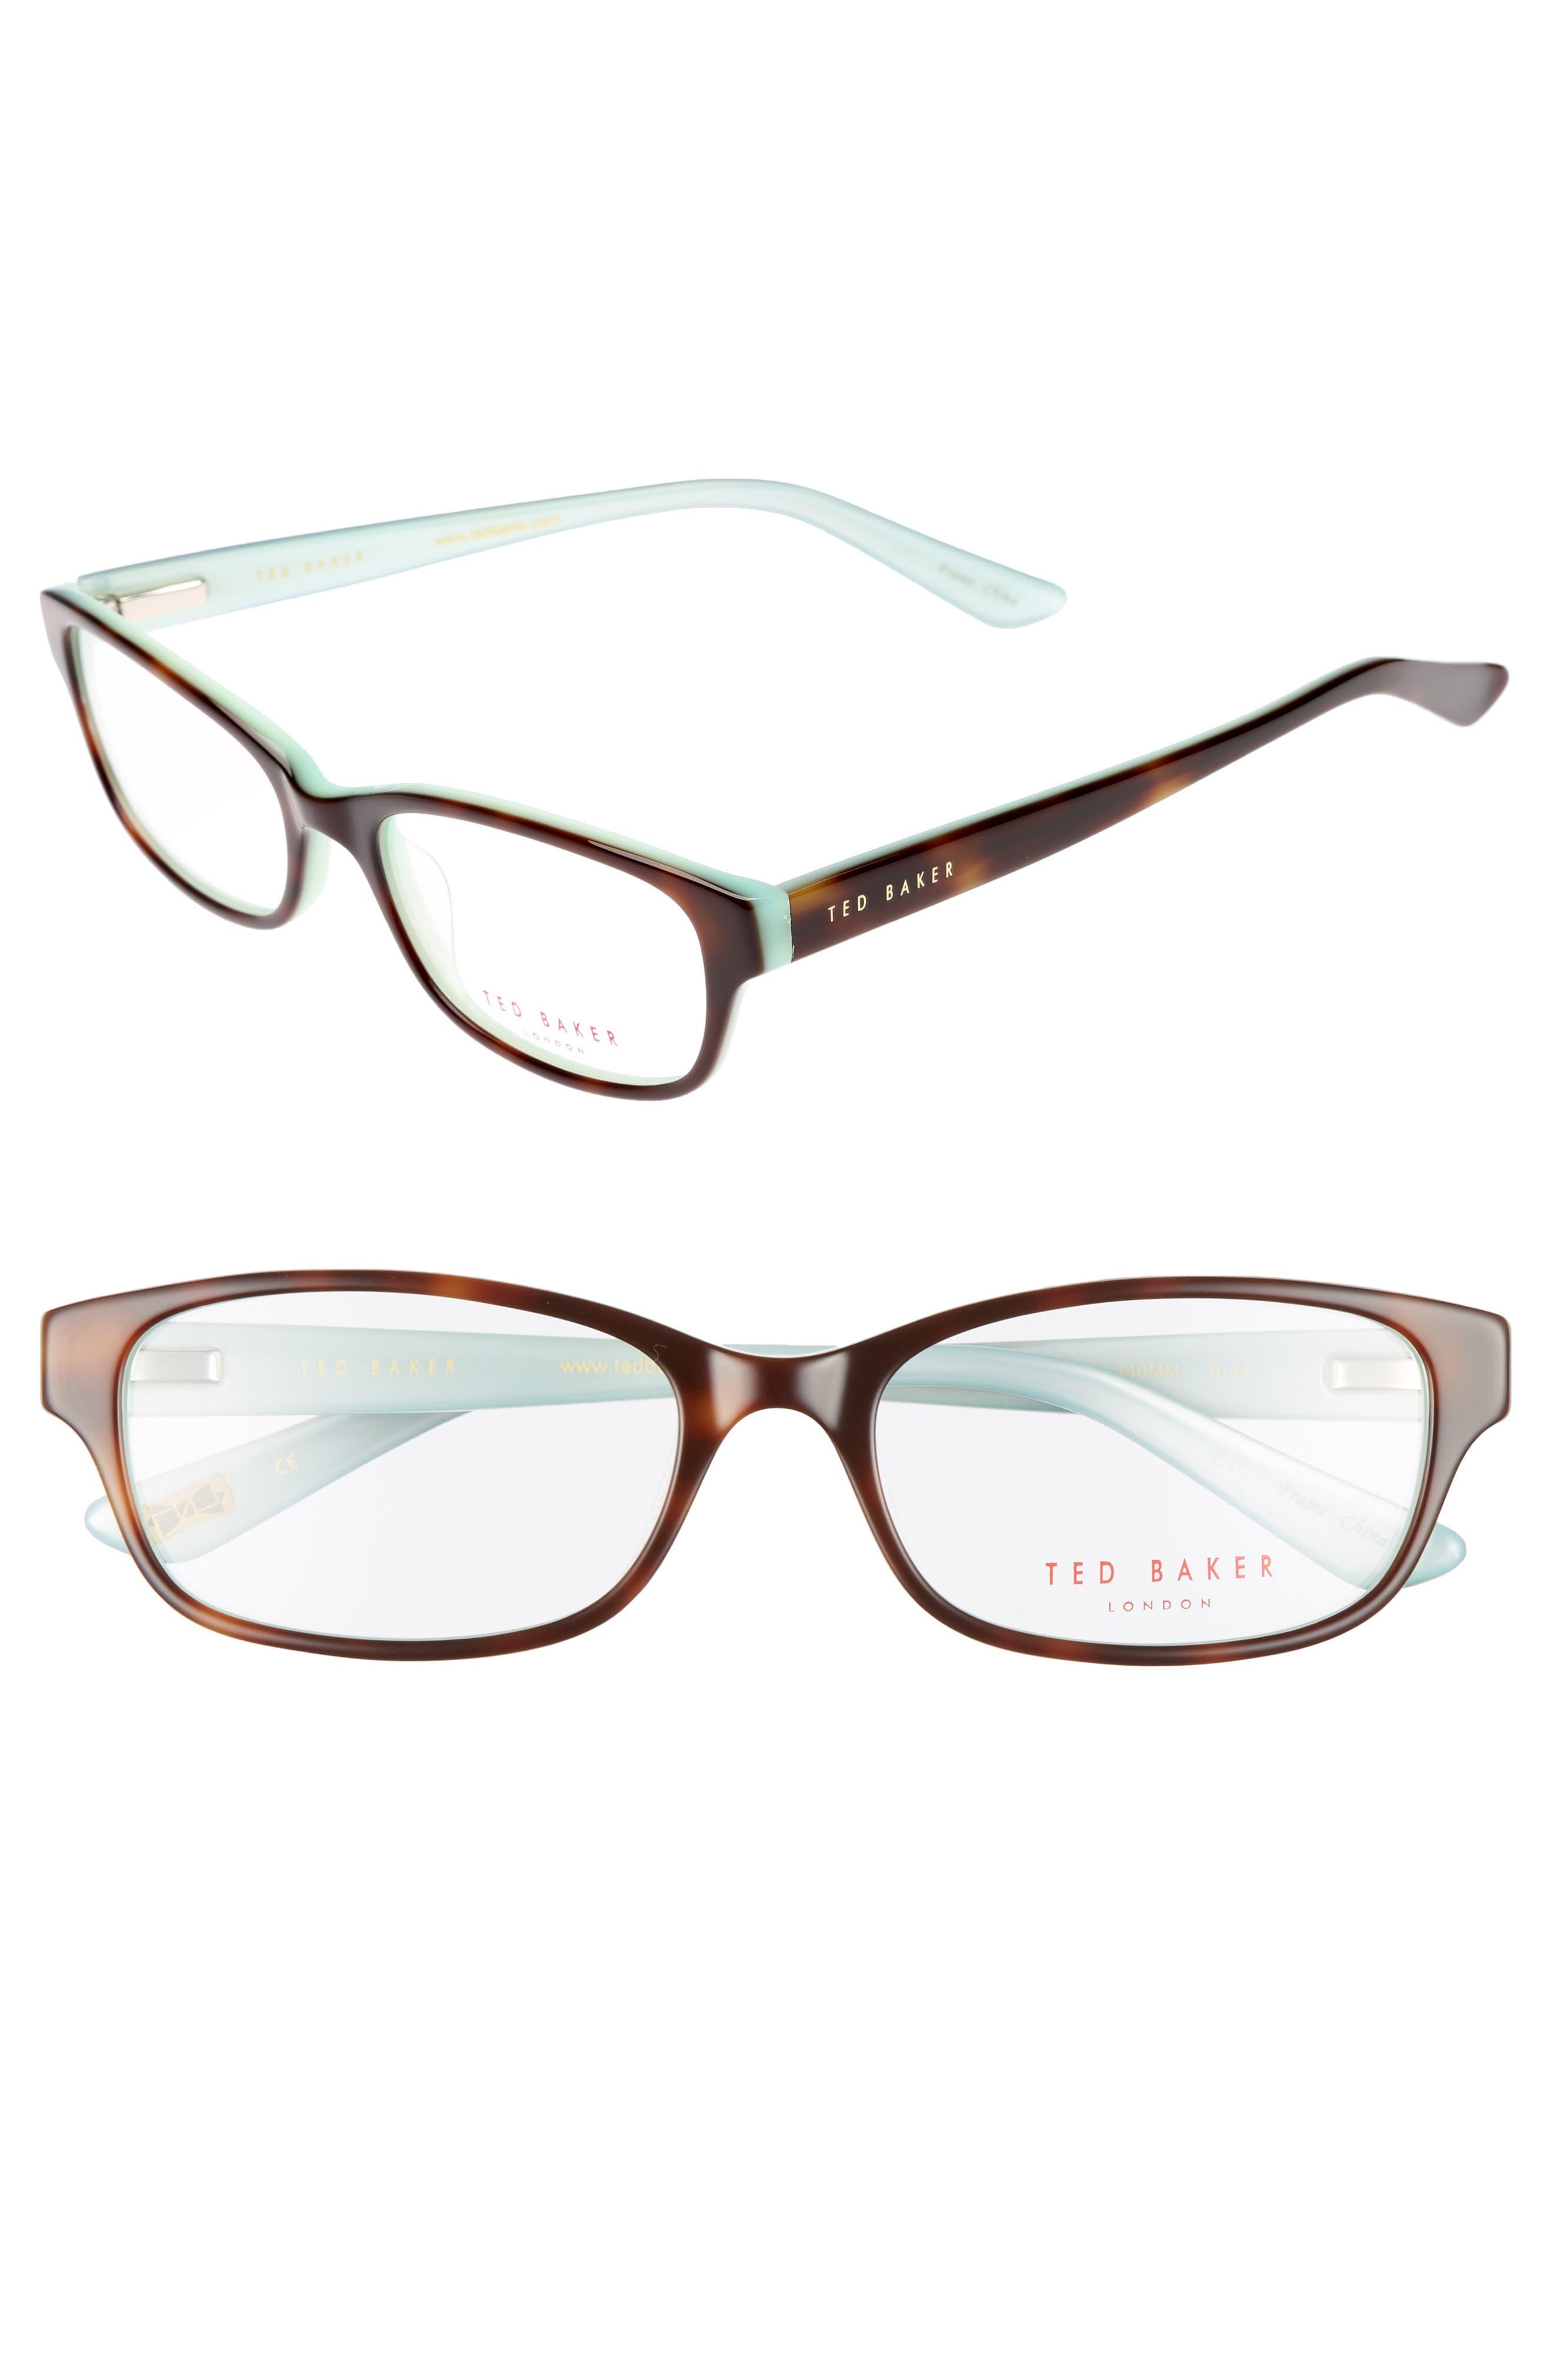 53mm Optical Glasses,                         Main,                         color, 200